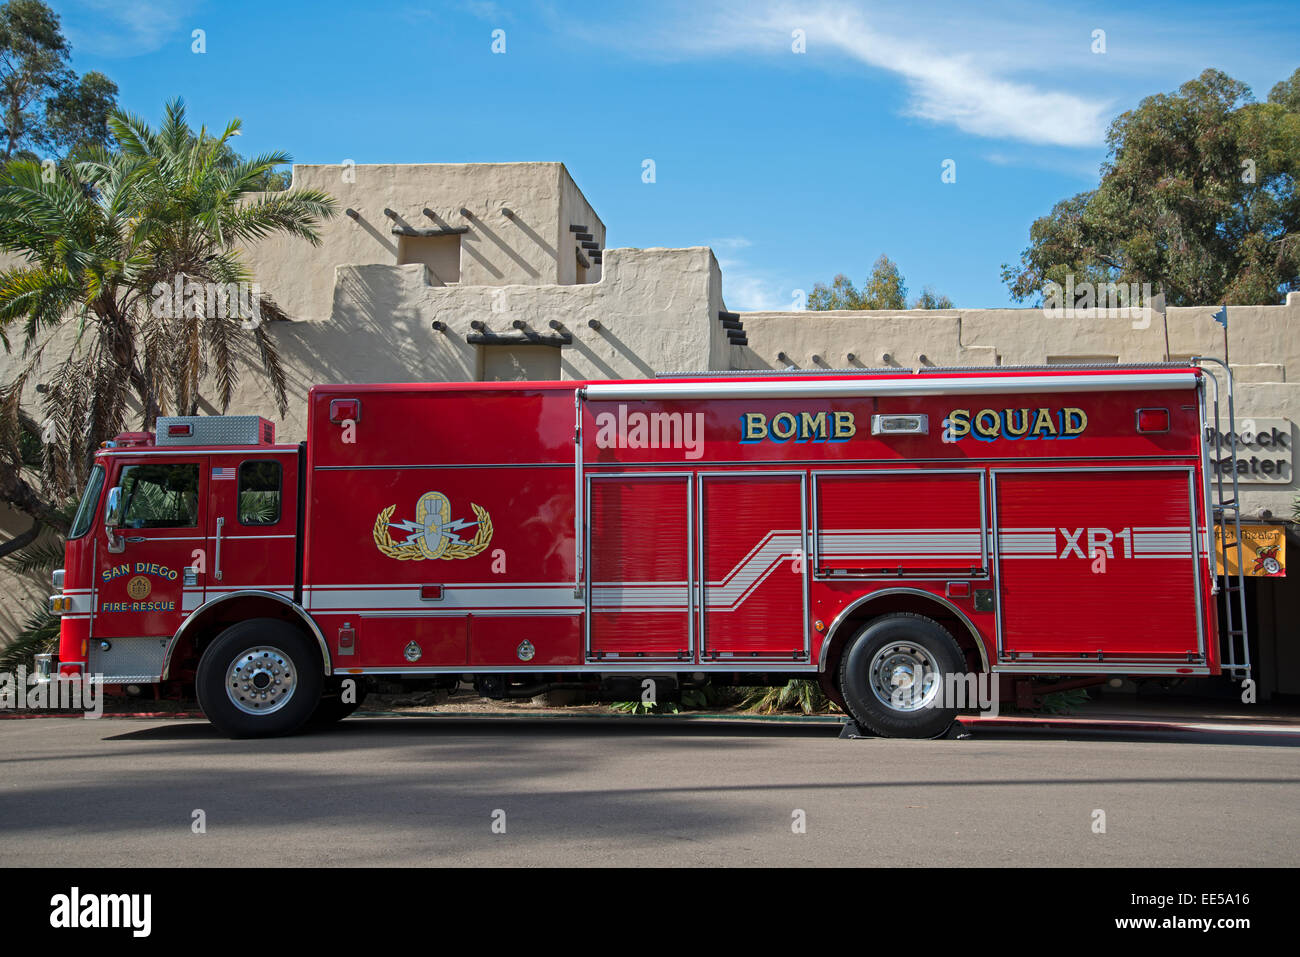 Bomb Squad Truck Stock Photos & Bomb Squad Truck Stock